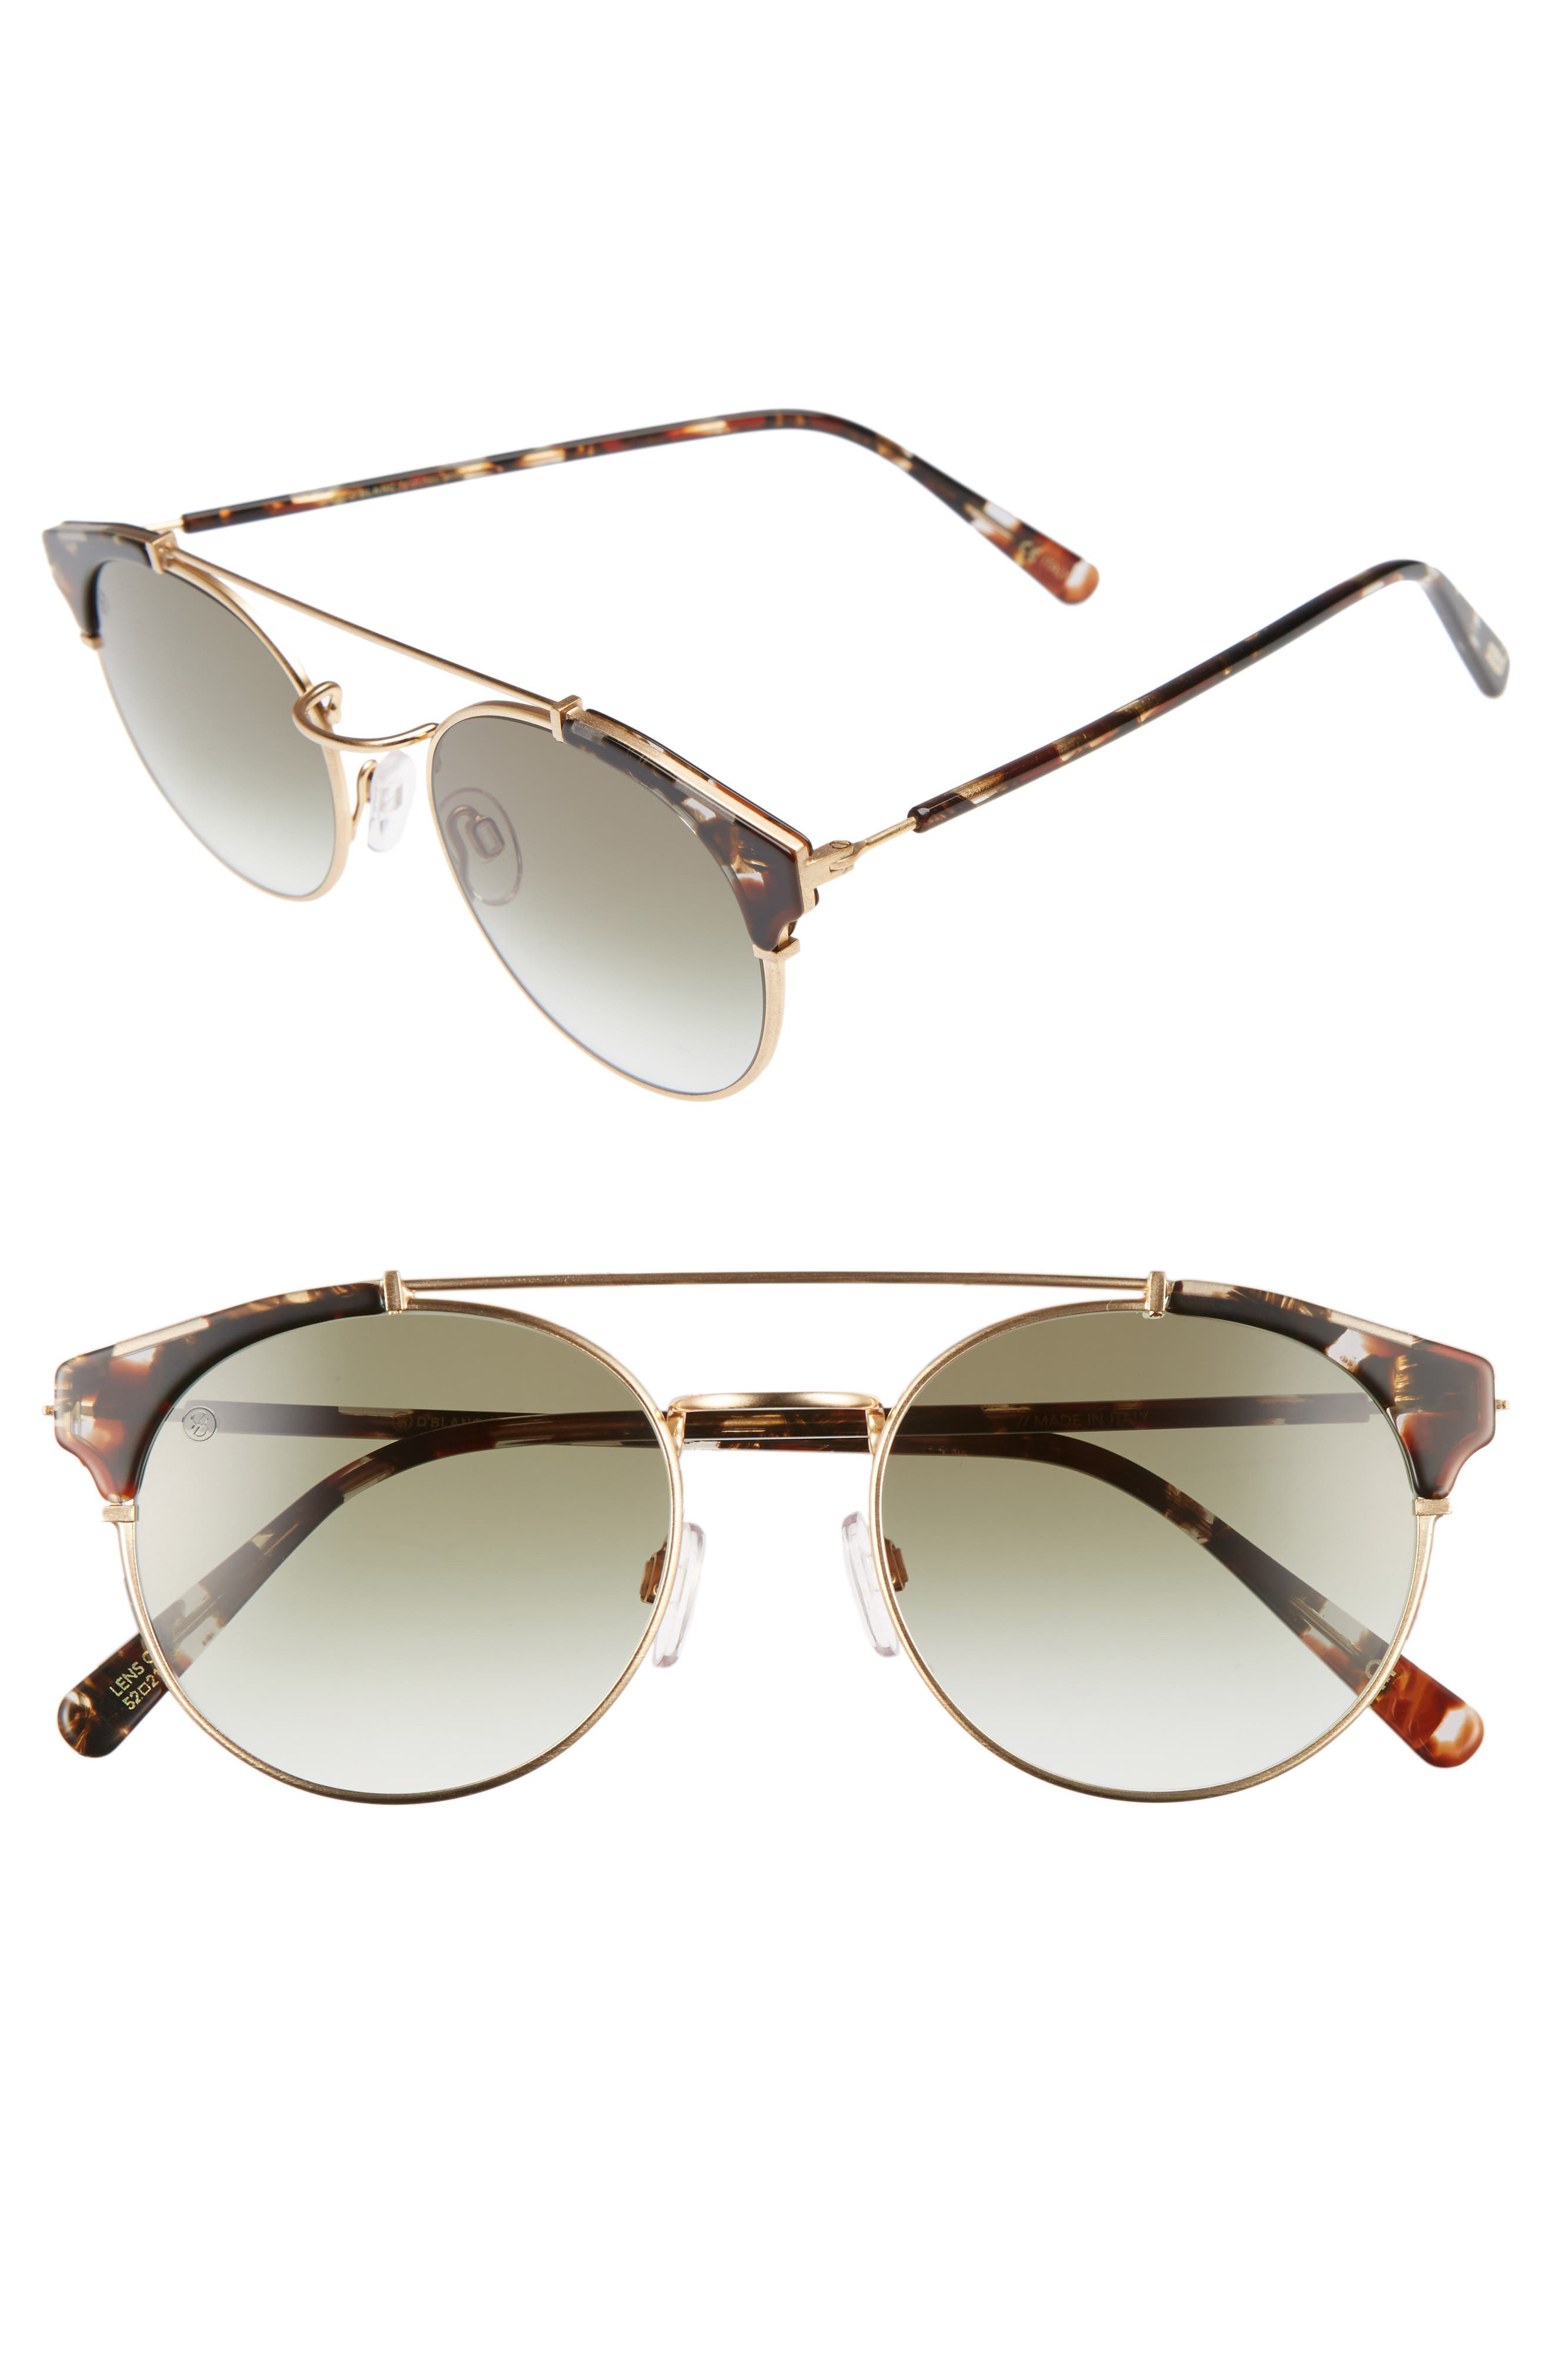 DBLANC DBLANC x Amuse Society Dosed Marquis 52mm Gradient Round Aviator Sunglasses